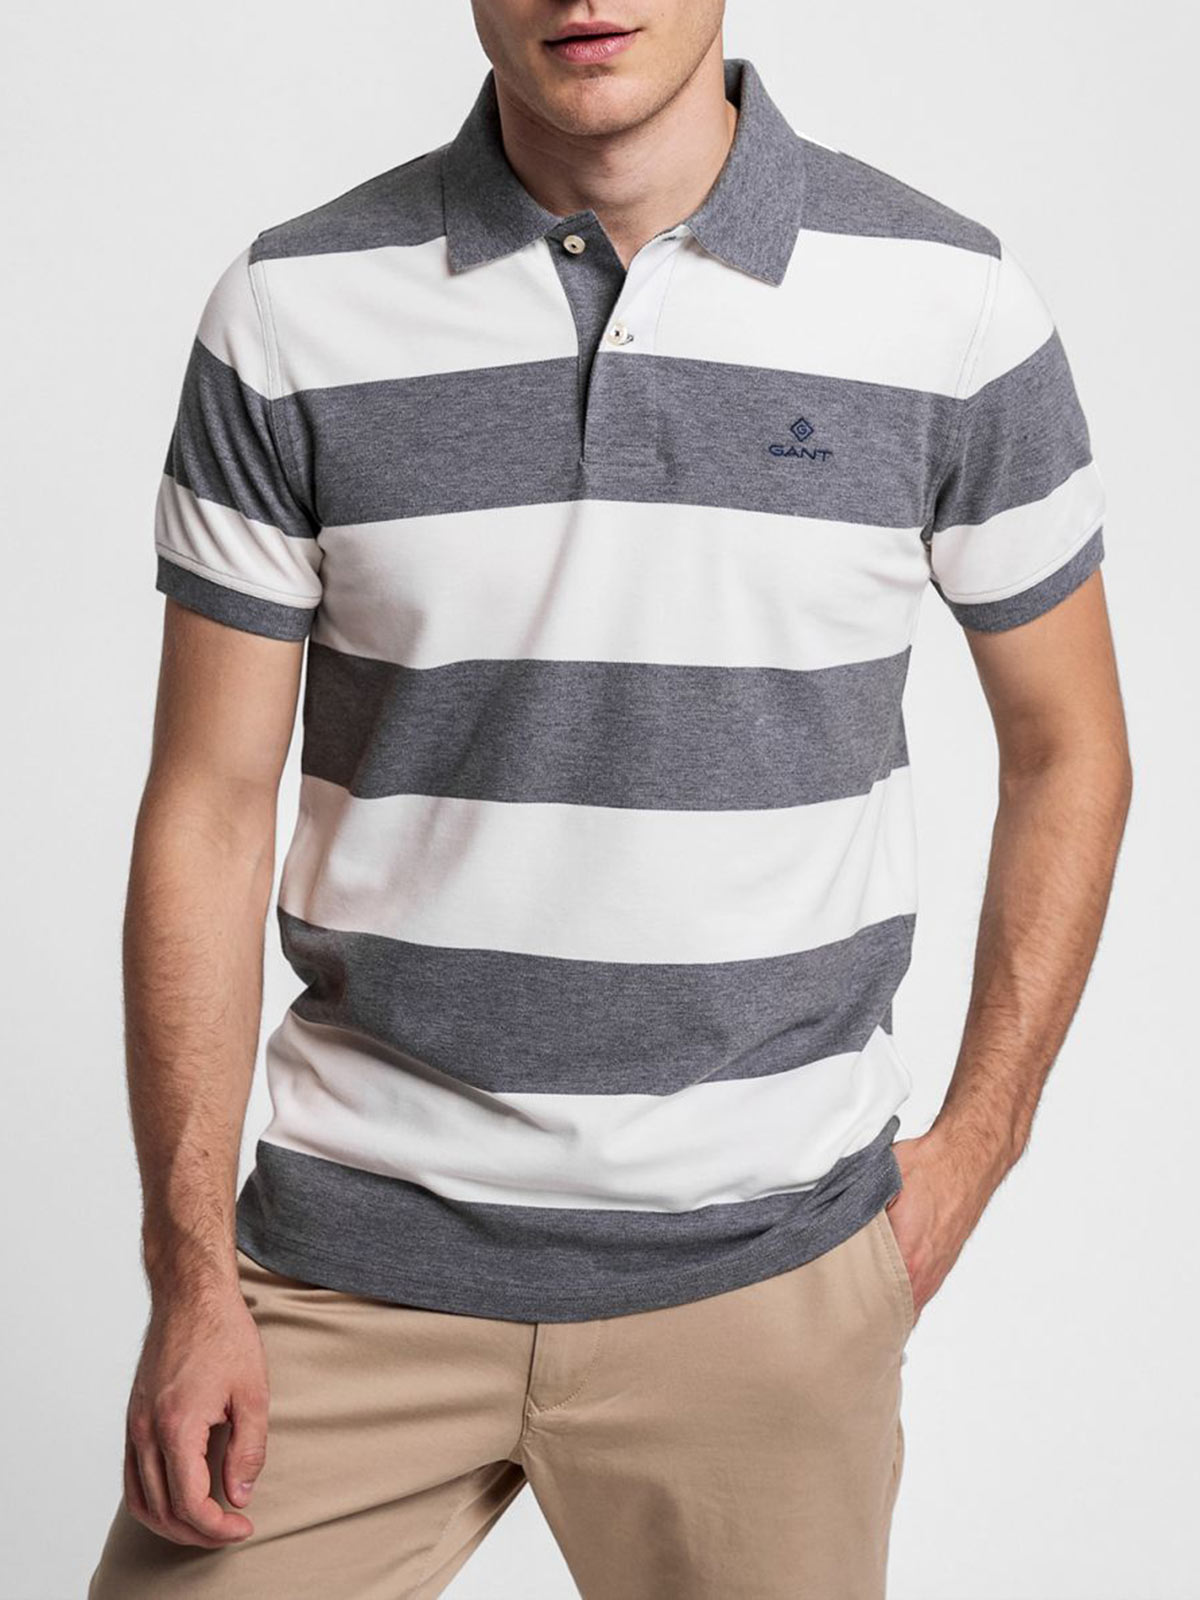 Nwt Gant Men´s Polo T polo shirt shirt